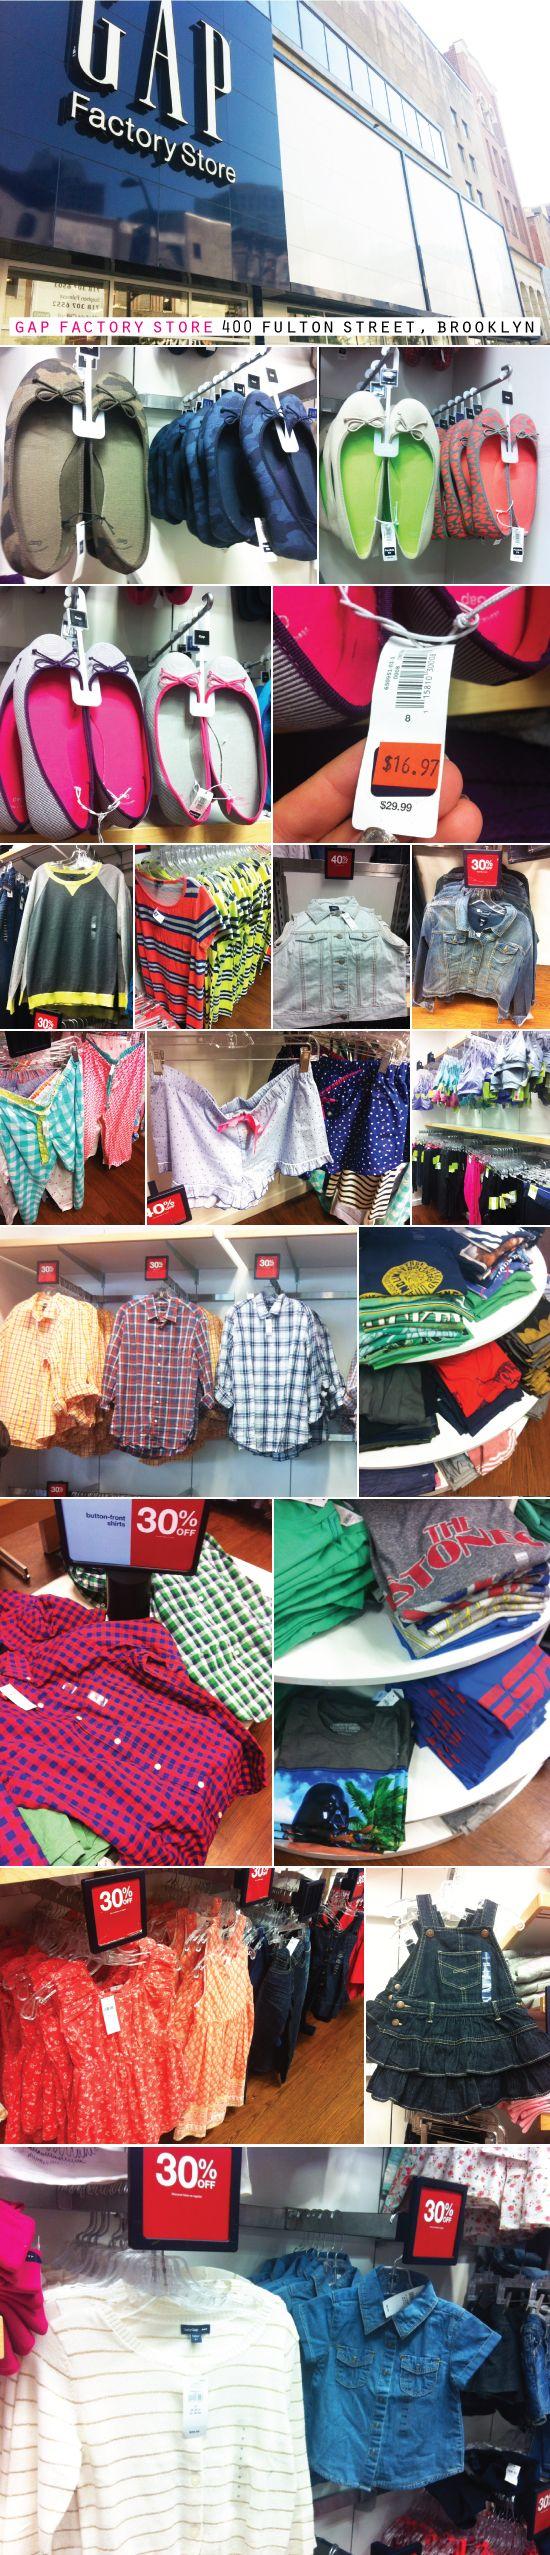 ny-new-york-gap-loja-de-fabrica-outlet-onde-comprar-compras-dica-moda-roupas-bebe-homem-masculina-tips-blog-look-starving-brooklyn